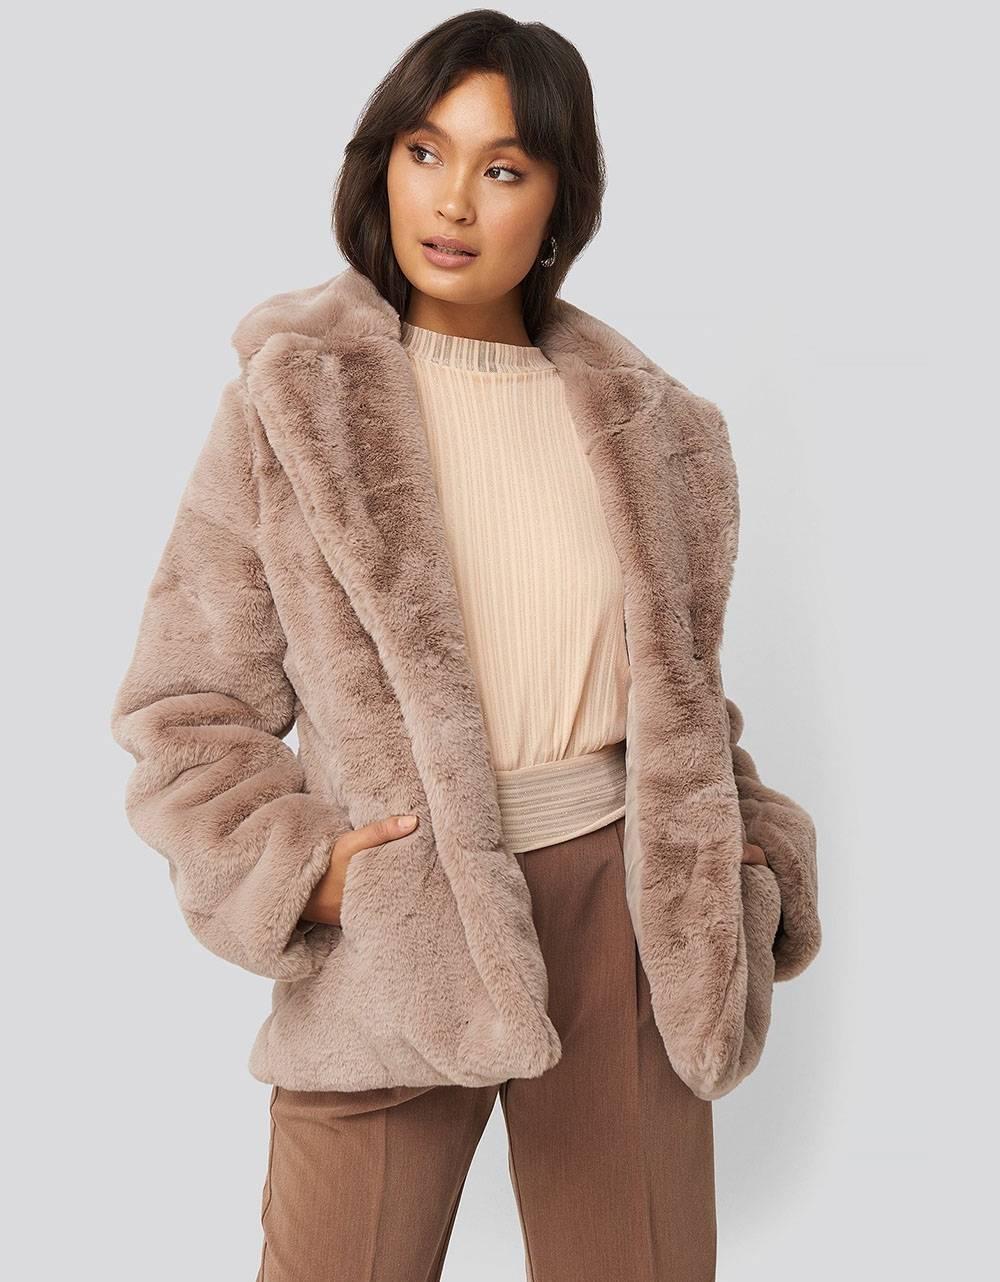 NA-KD colored faux fur short coat - dusty pink NA-KD Coat 115,00€